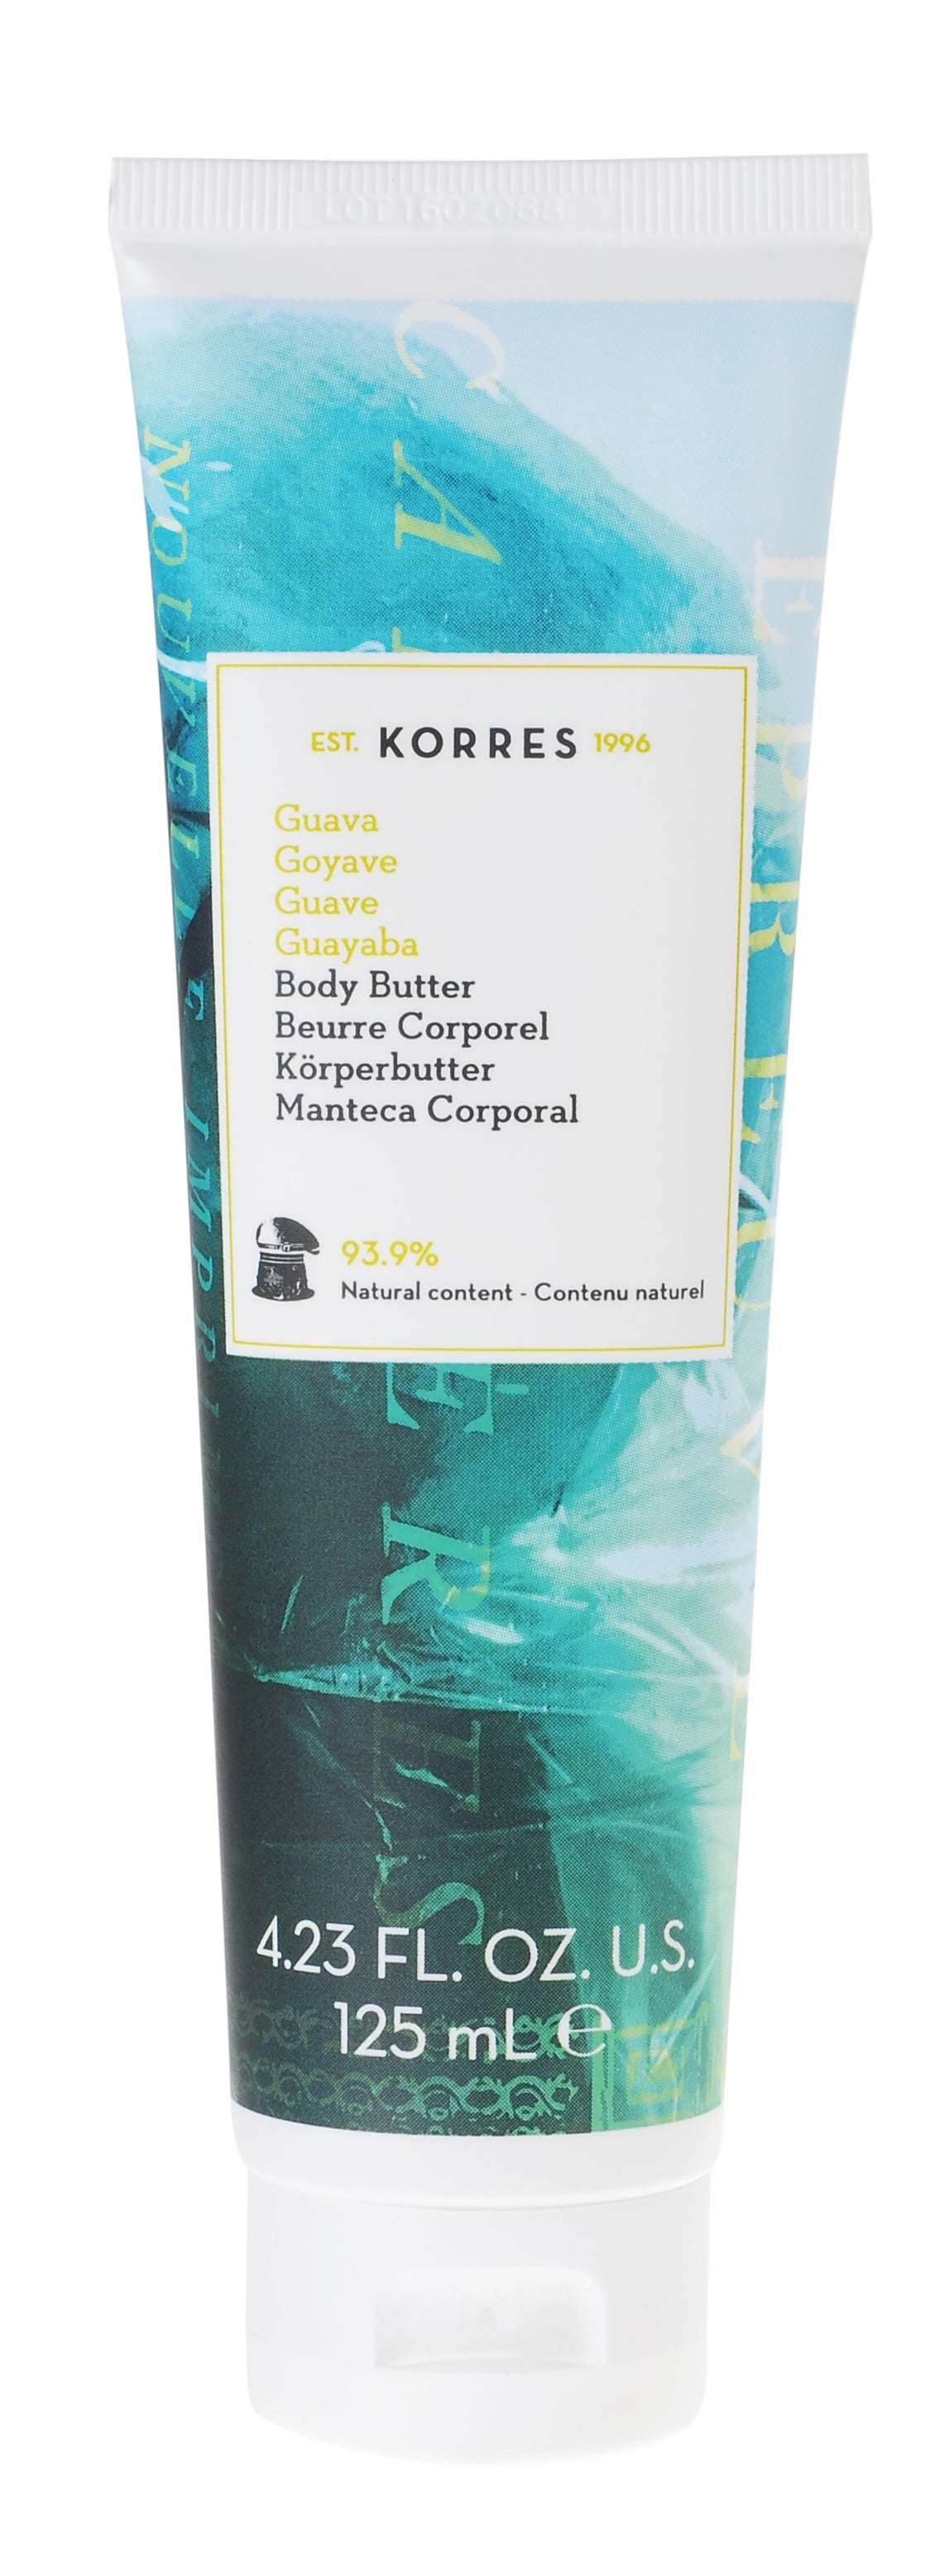 Korres Body Butter Guava Βούτυρο Καριτέ με Εκχύλισμα Guava για Πλούσια Ενυδάτωση & Τροφή σε Όλο το Σώμα, 125ml